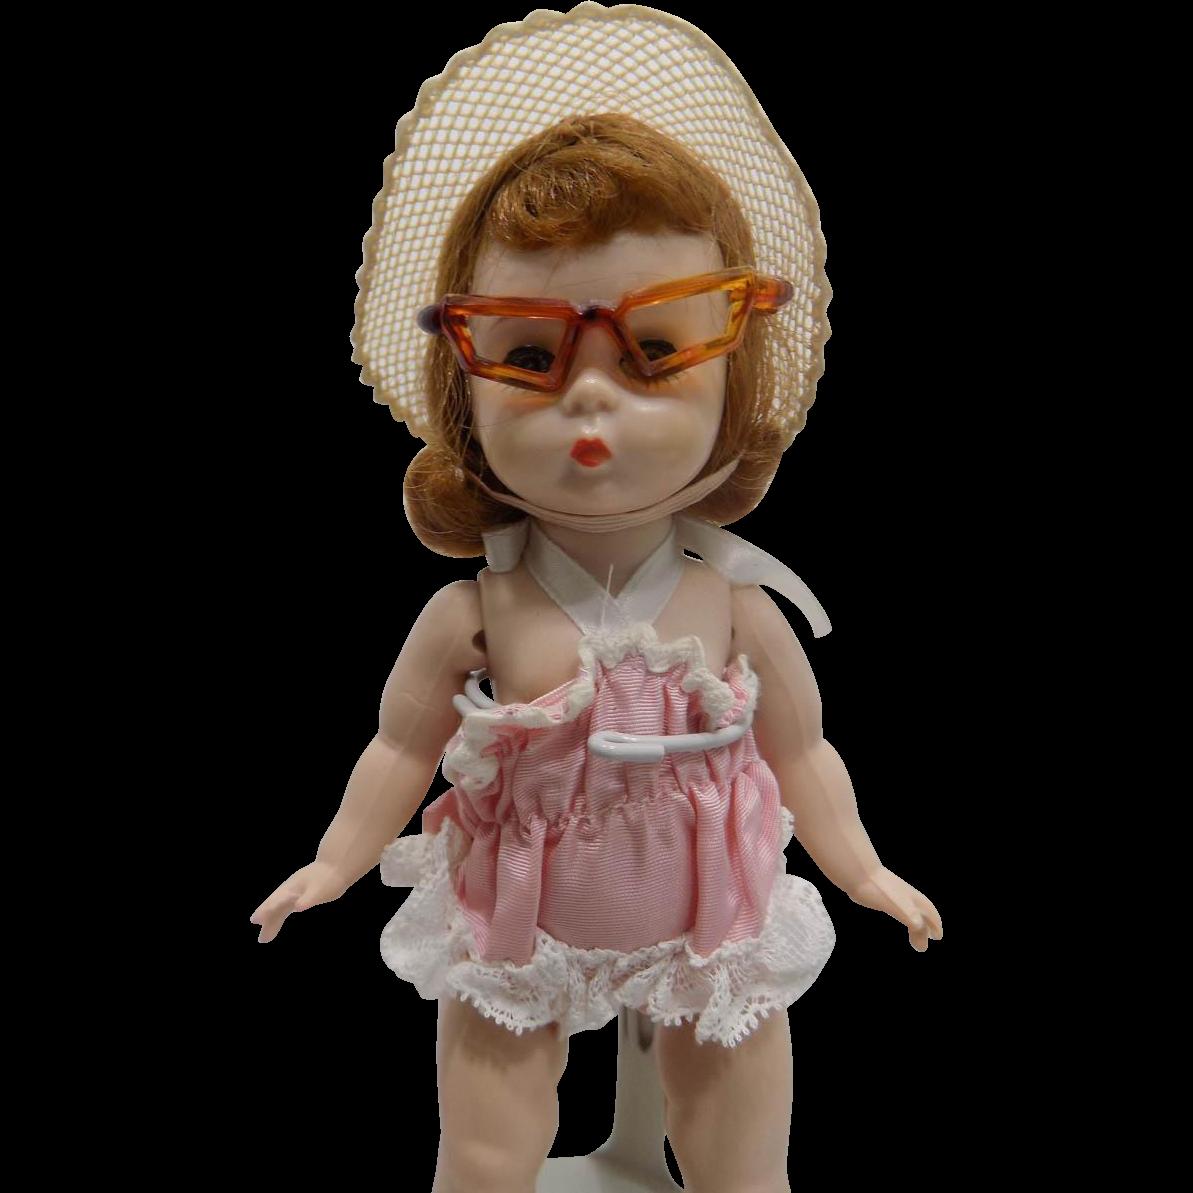 Vintage Madame Alexander Kins 1955 SLW Doll Wendy Loves To Swim #406